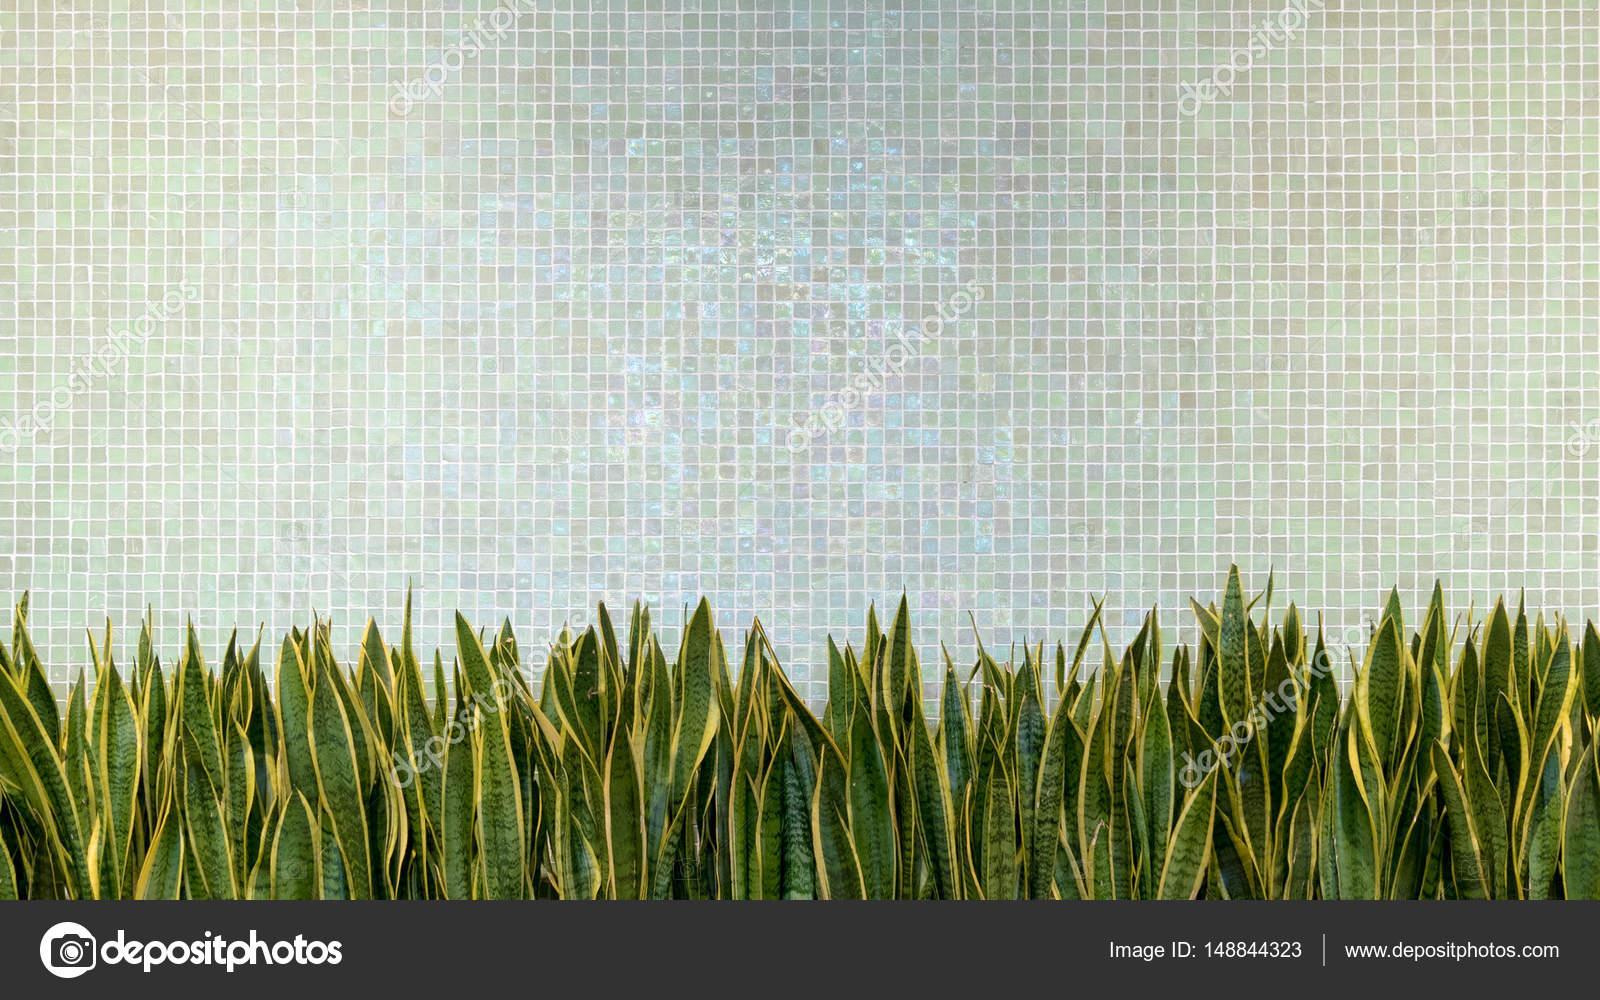 Parete verde piastrelle in porcellana mosaico texture sfondo con